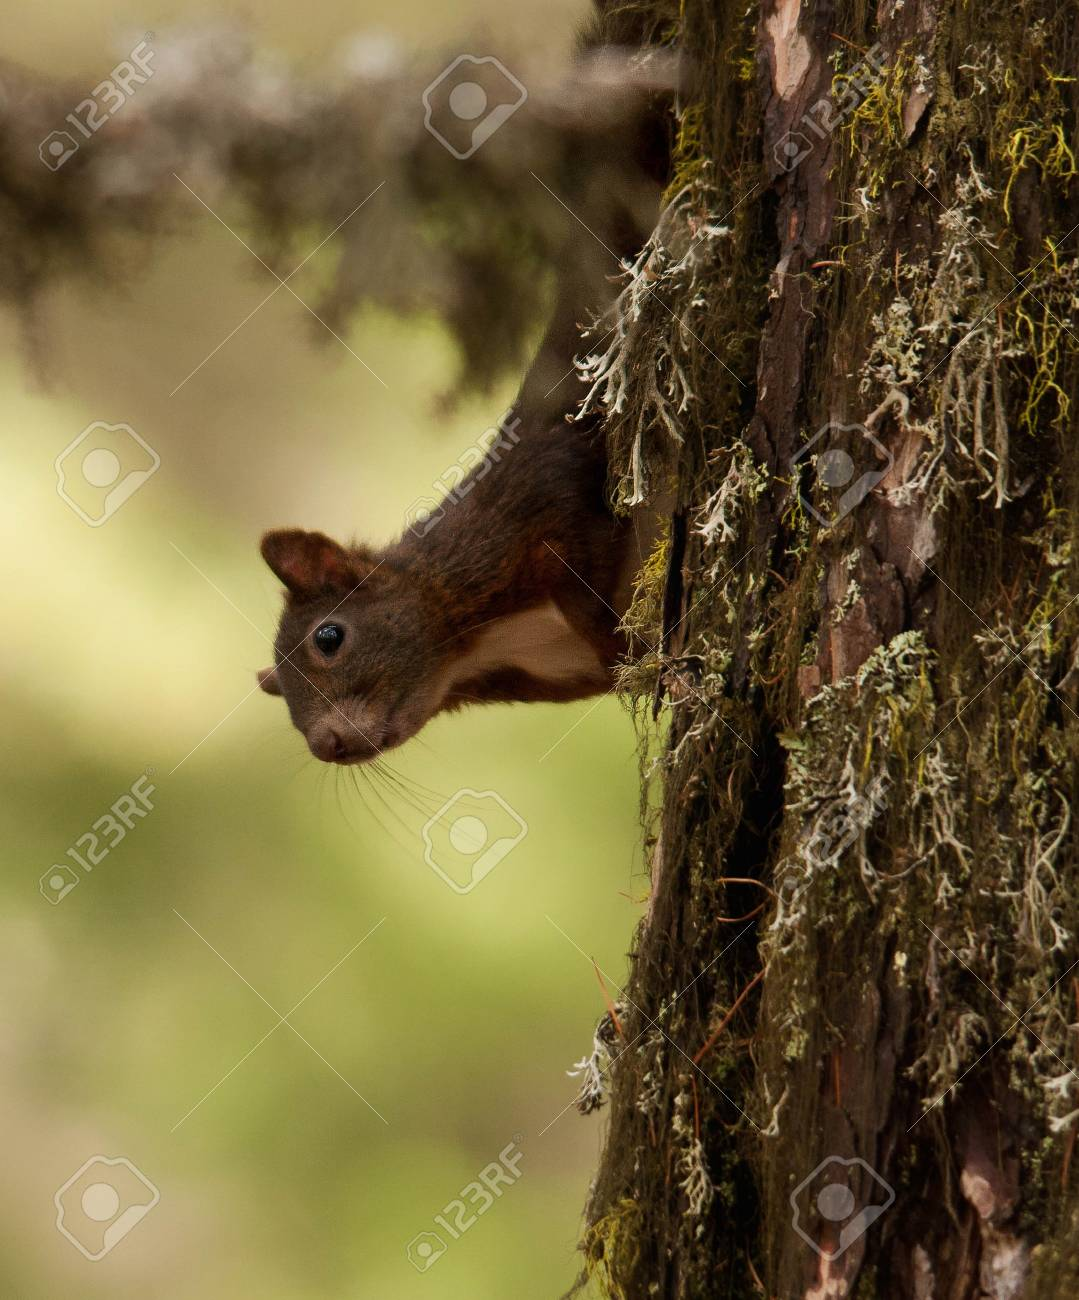 squirrel Stock Photo - 7991471